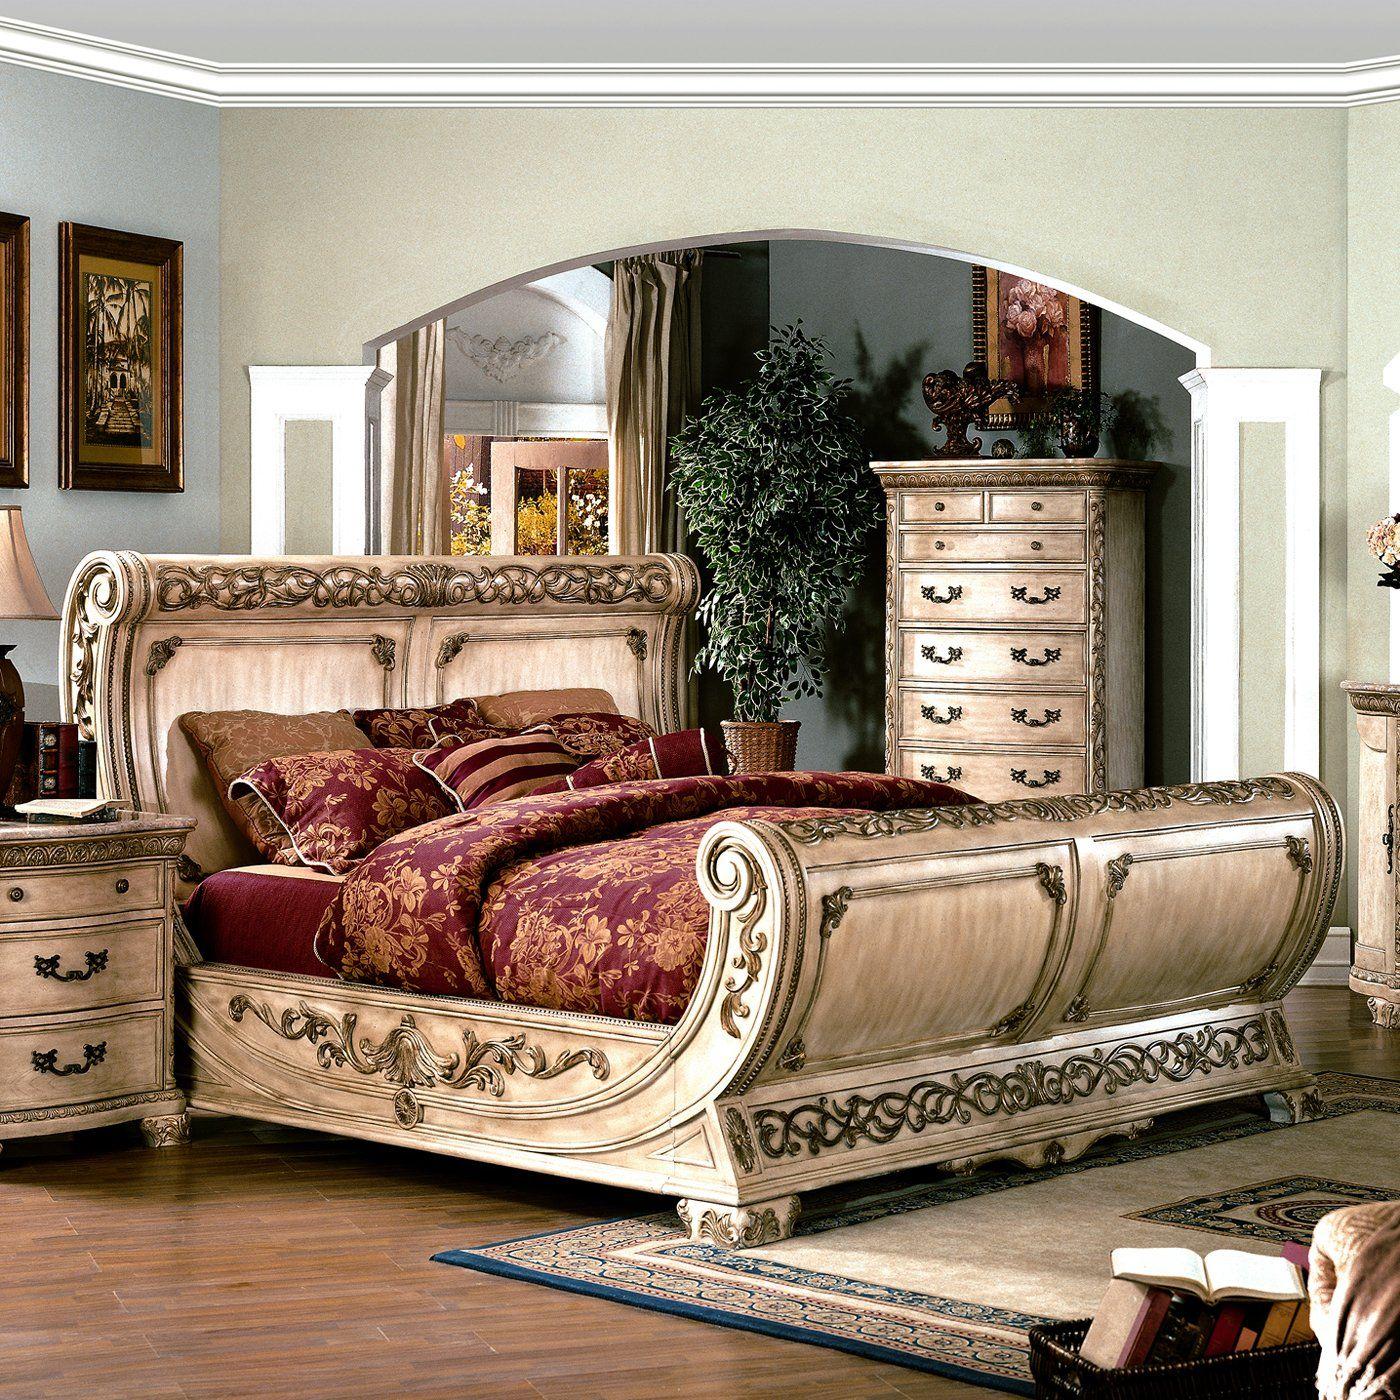 Yuan Tai Furniture Cannes Sleigh Bed Phong Ngủ